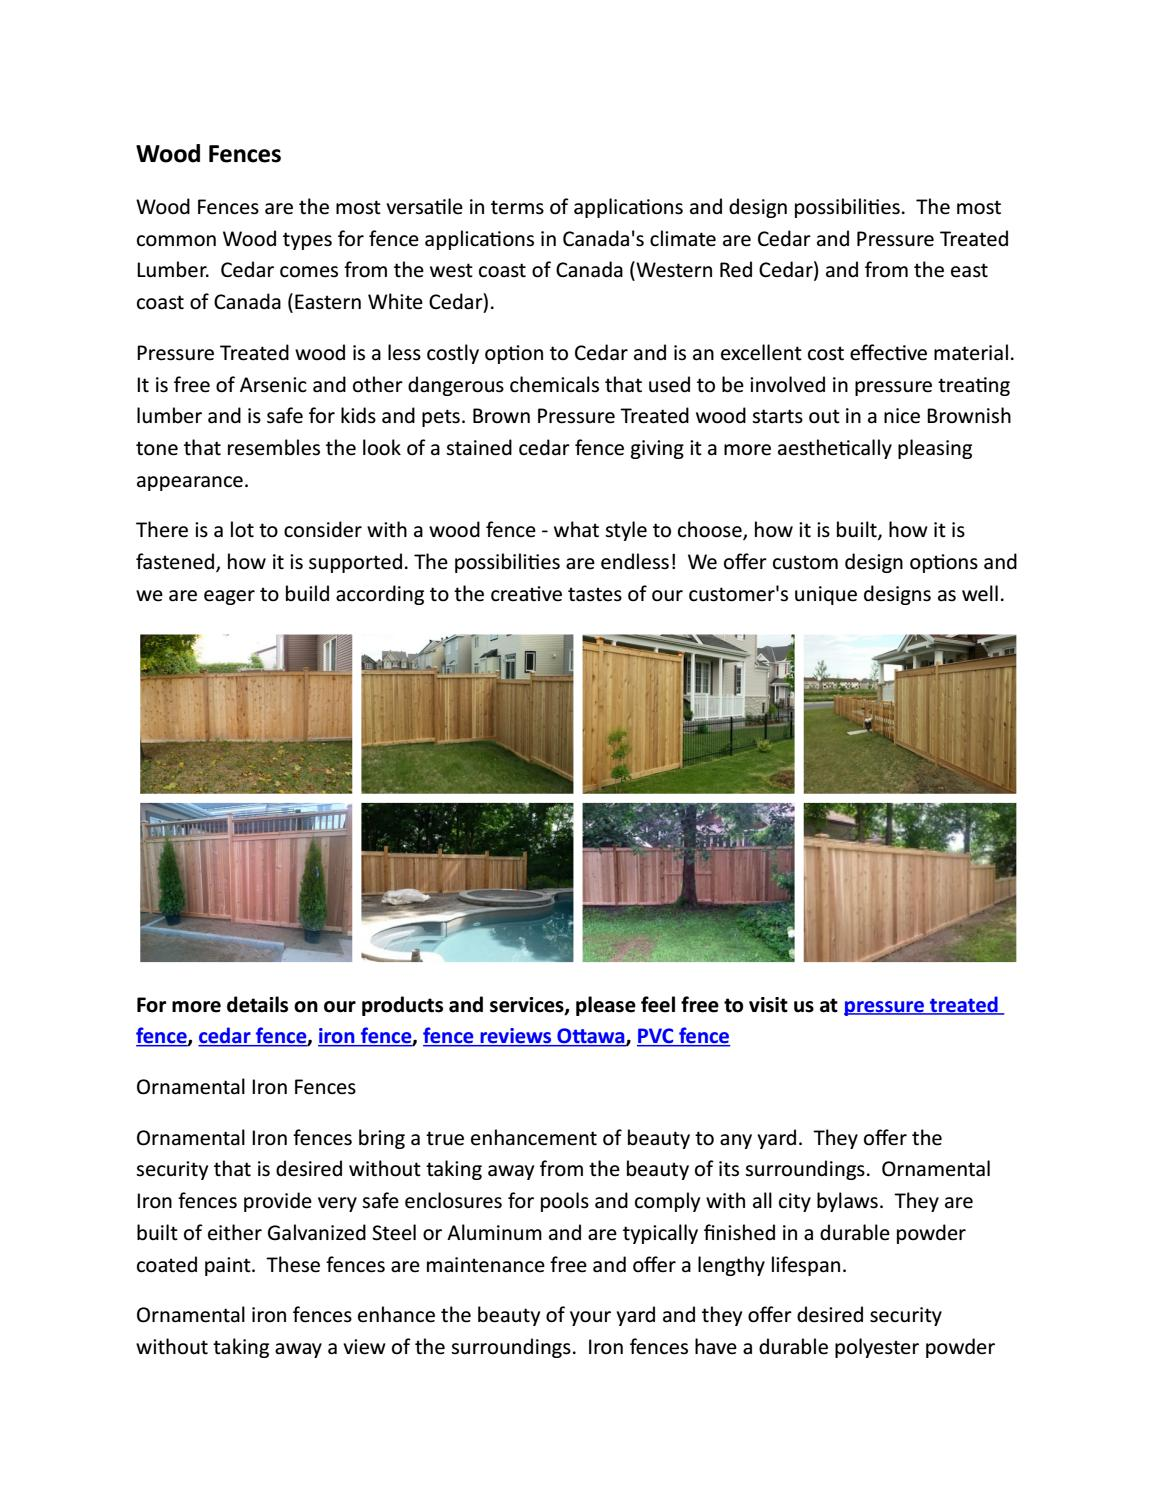 Wood Fences by fencescape02 - issuu